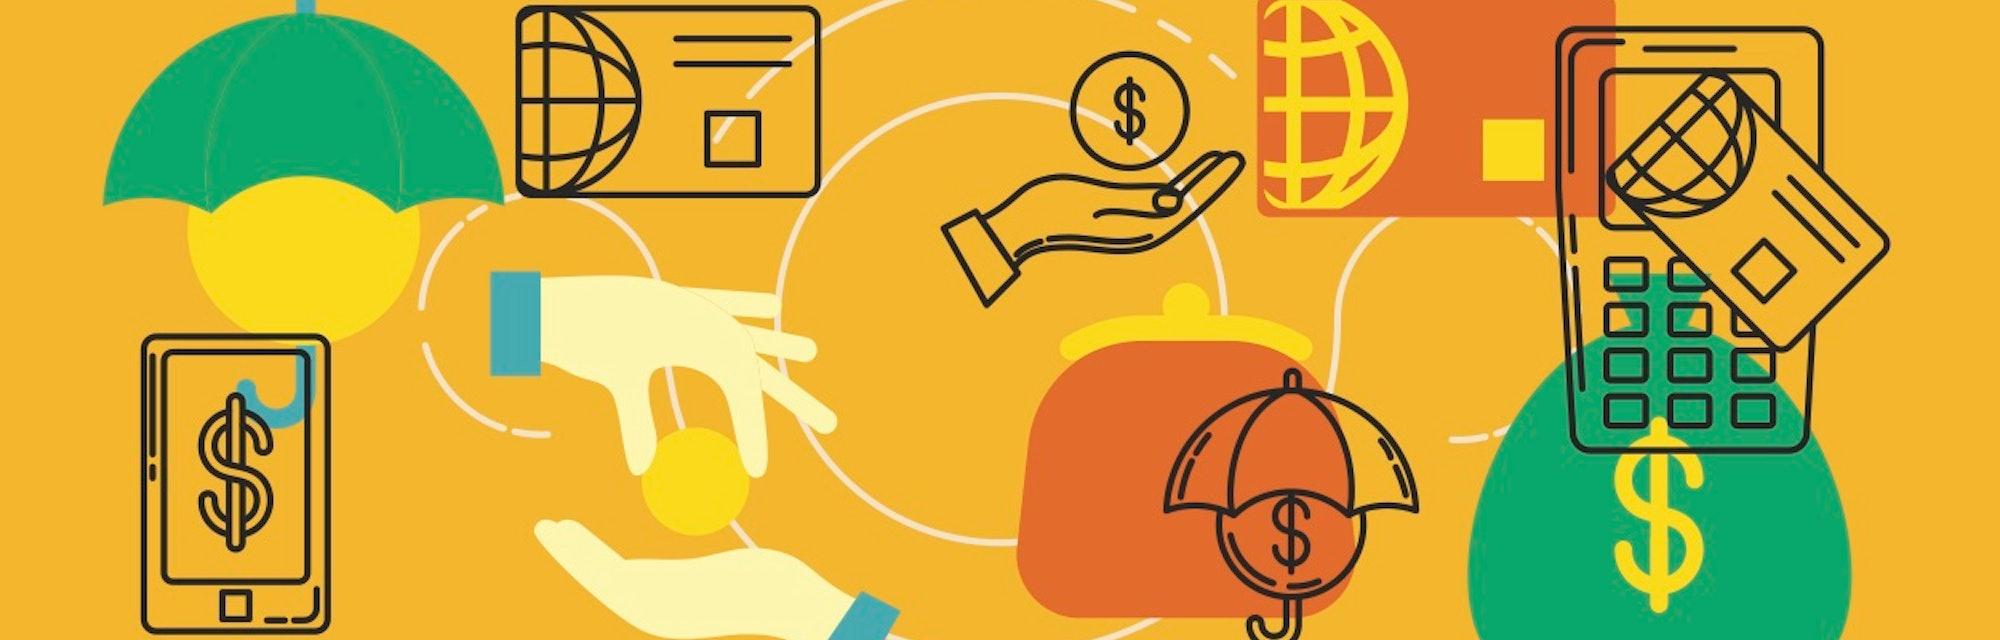 credit card perks e-commerce illustration